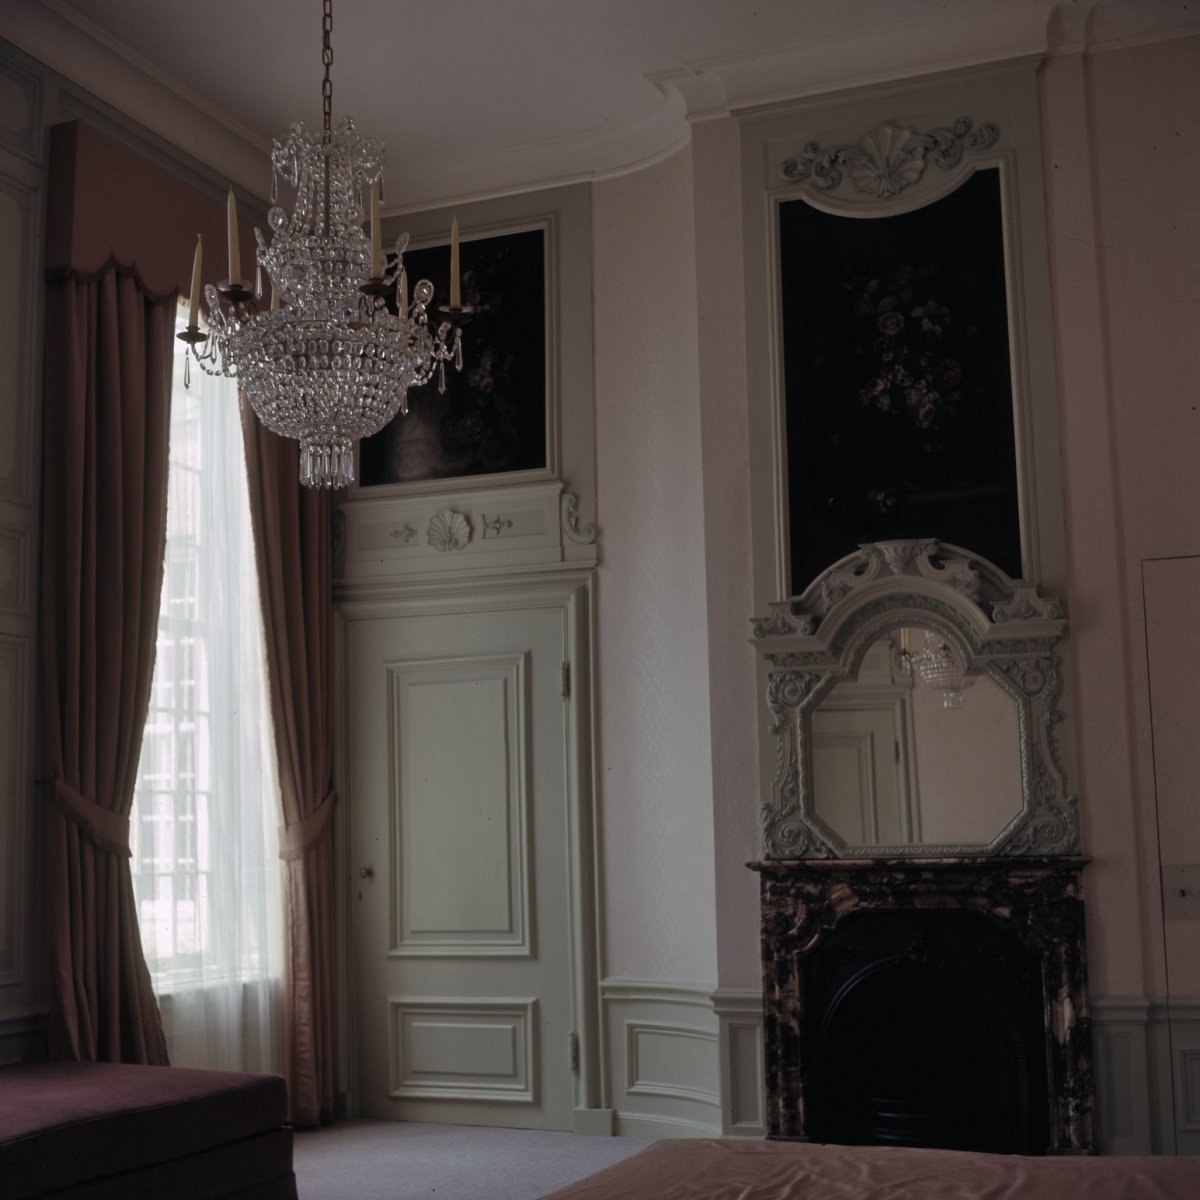 Raumgestaltung woonkamer kleuren - Interieur slaapkamer ...